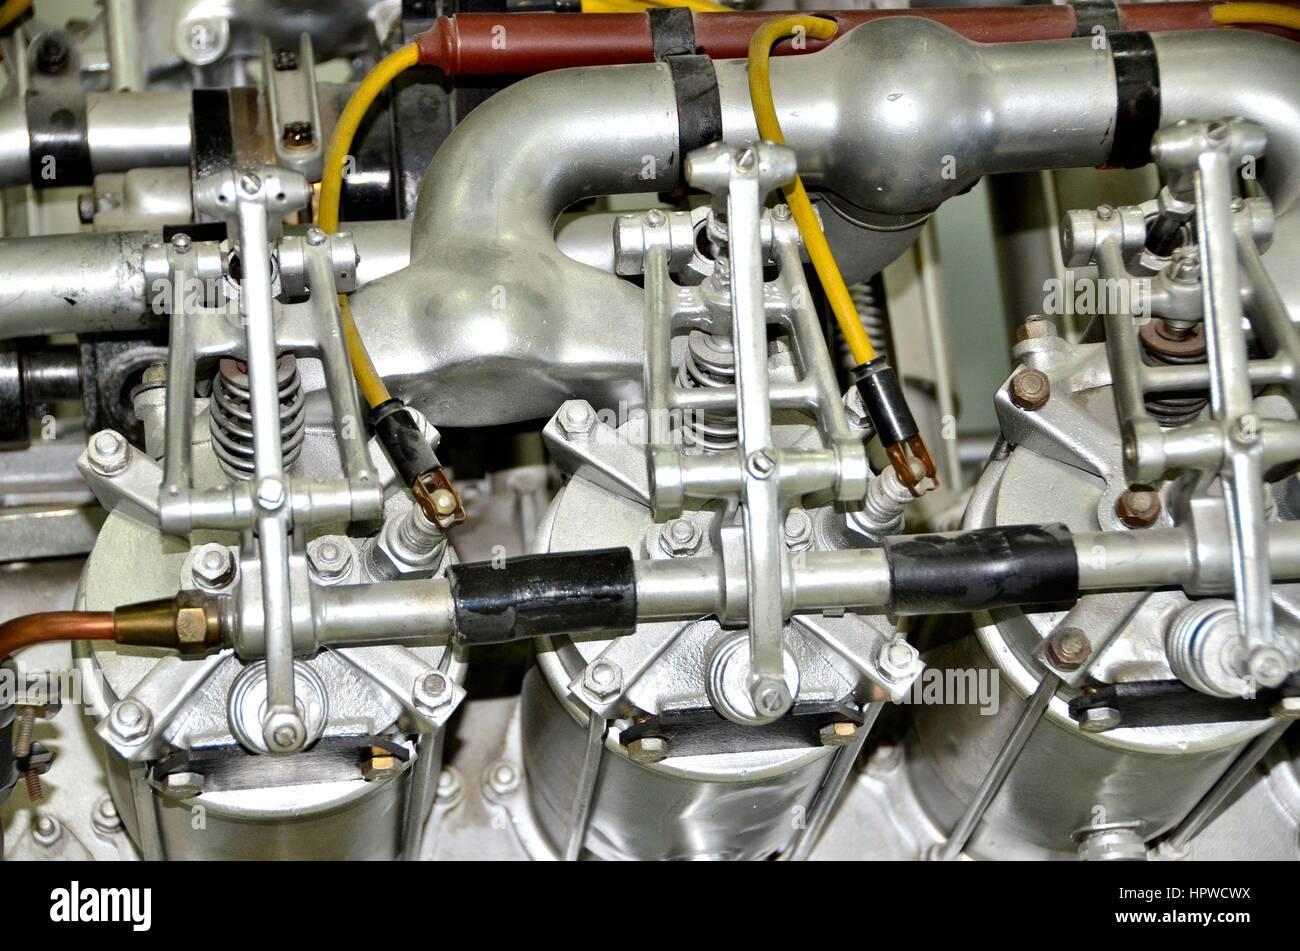 Hohe Leistung auto motor Teile Stockfoto, Bild: 134553942 - Alamy